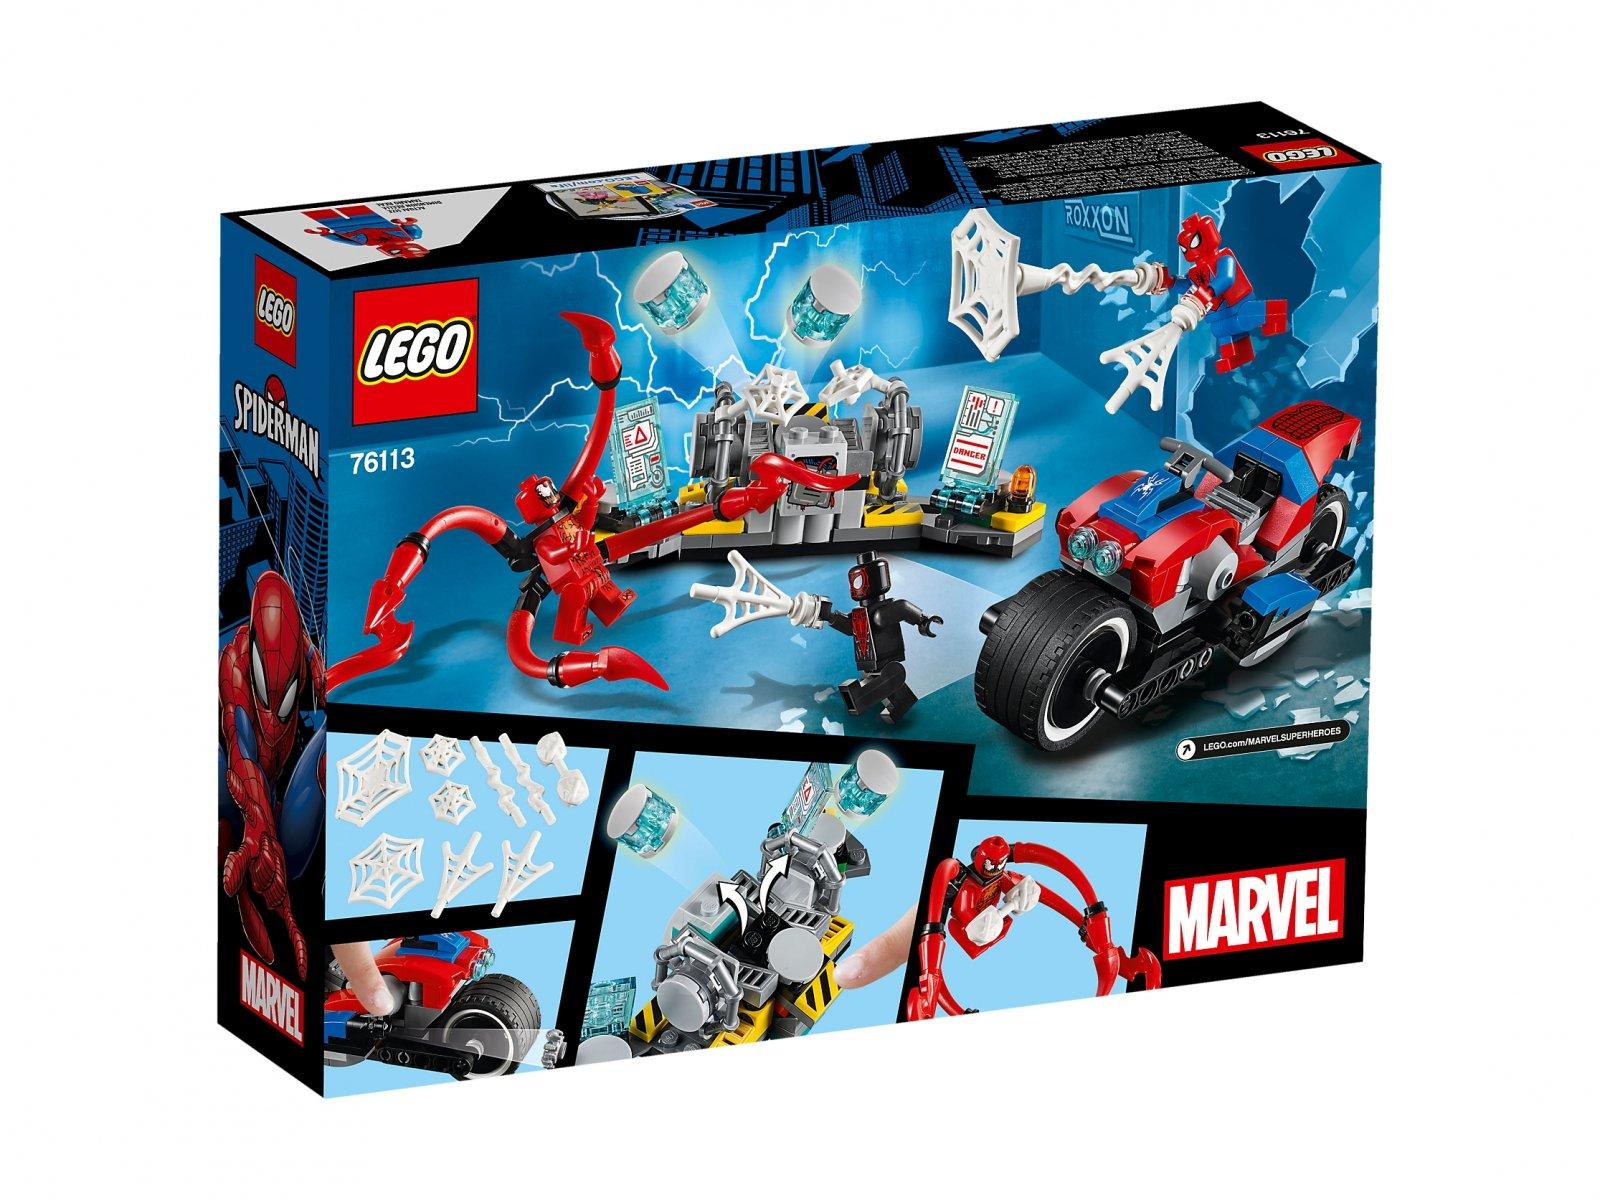 LEGO Marvel Super Heroes Pościg motocyklowy Spider-Mana 76113